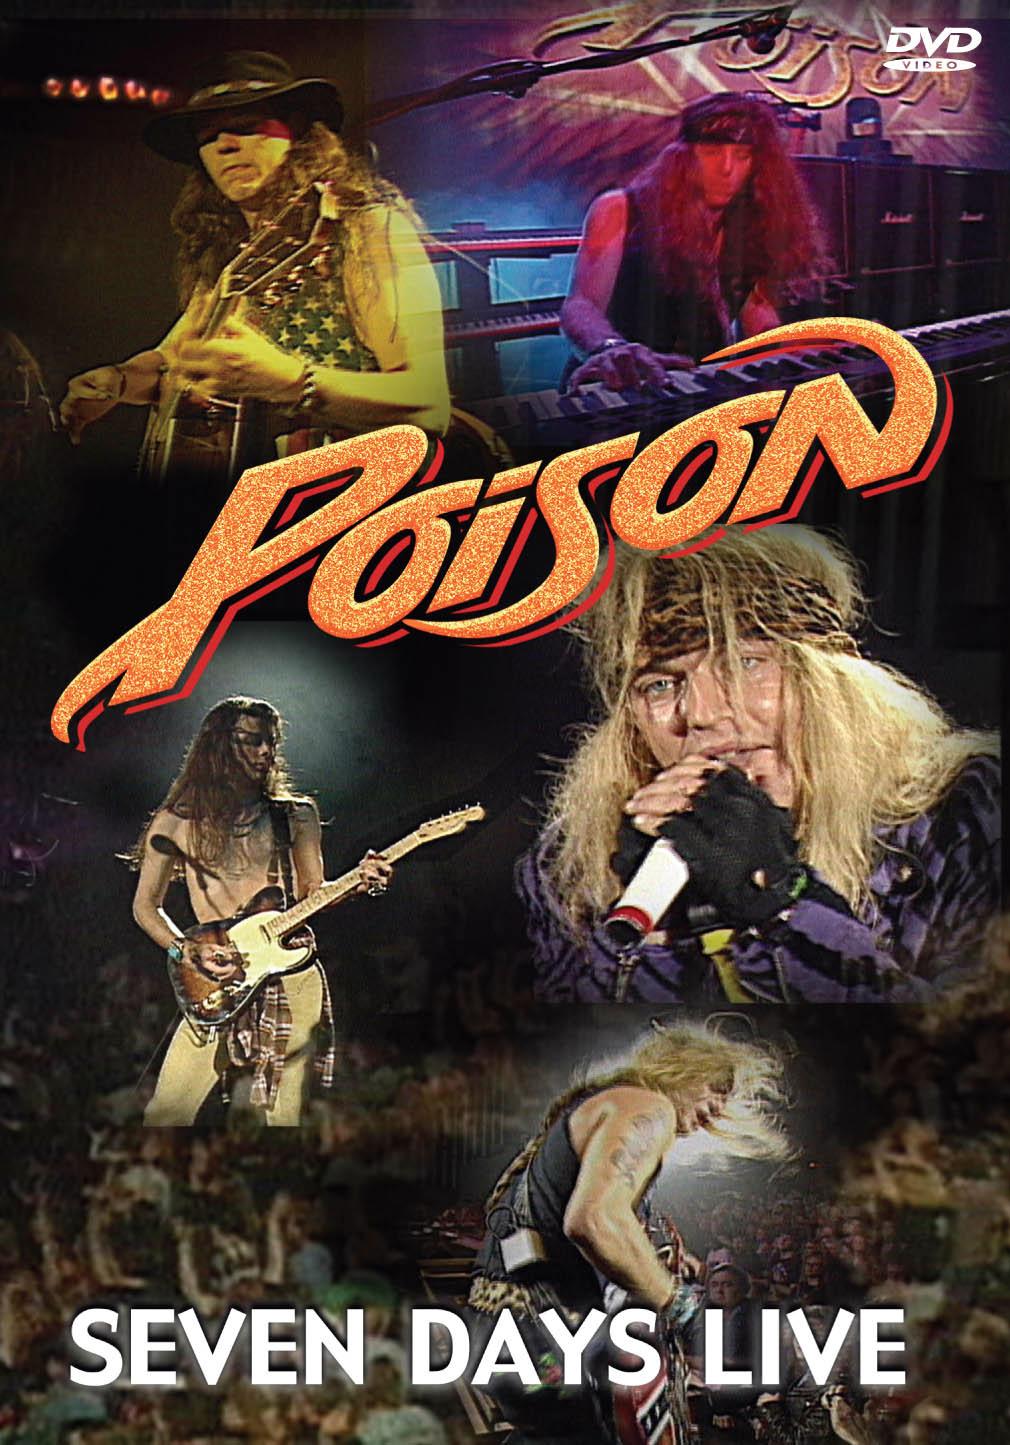 Poison – Seven Days Live (1993/2006):